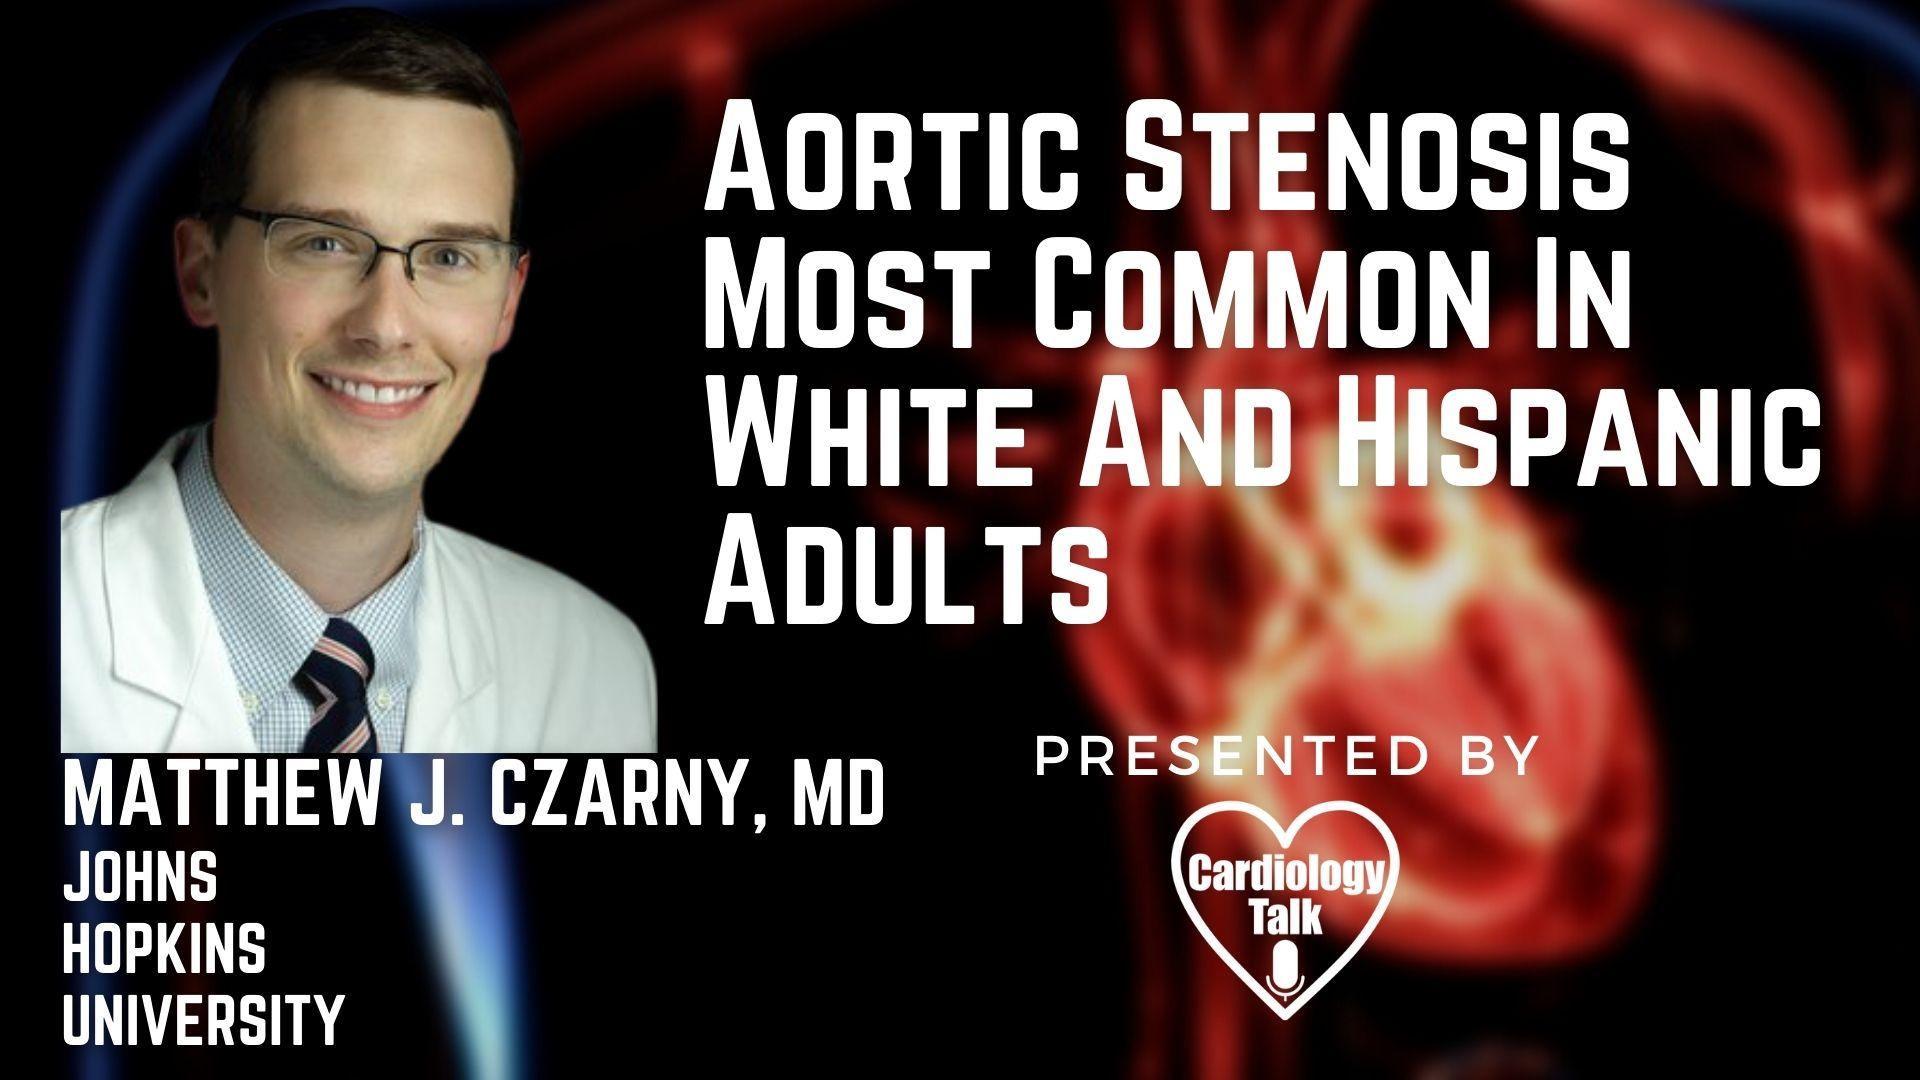 Matthew J. Czarny, MD @MatthewCzarnyMD @hopkinsheart @HopkinsMedicine #AroticStenosis #Cardiology #Research Aortic Stenosis Most Common In White And Hispanic Adults